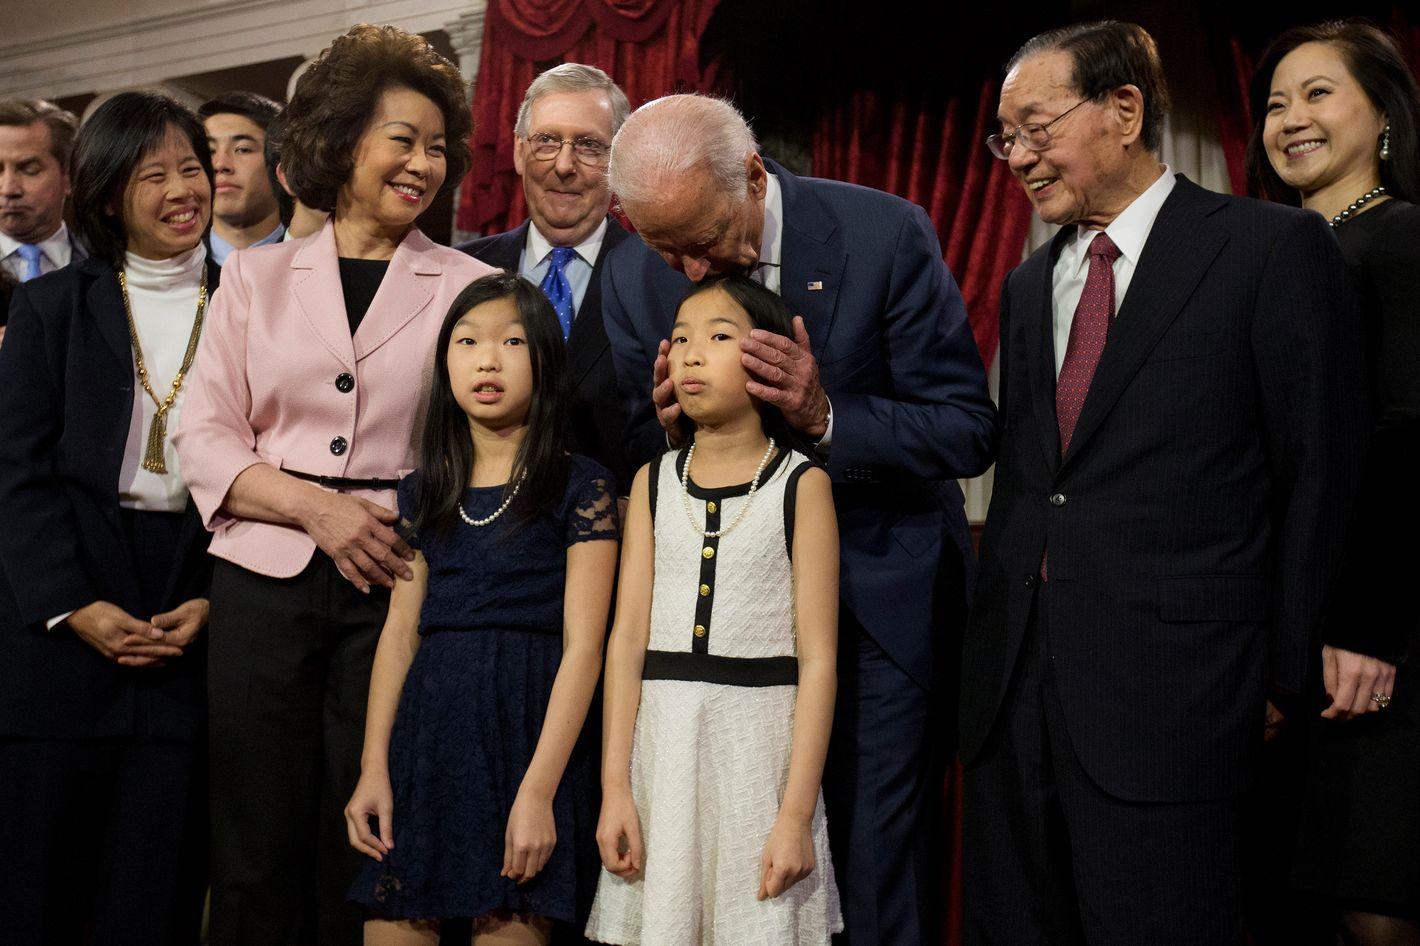 9 Times Joe Biden Creepily Whispered In Womens Ears